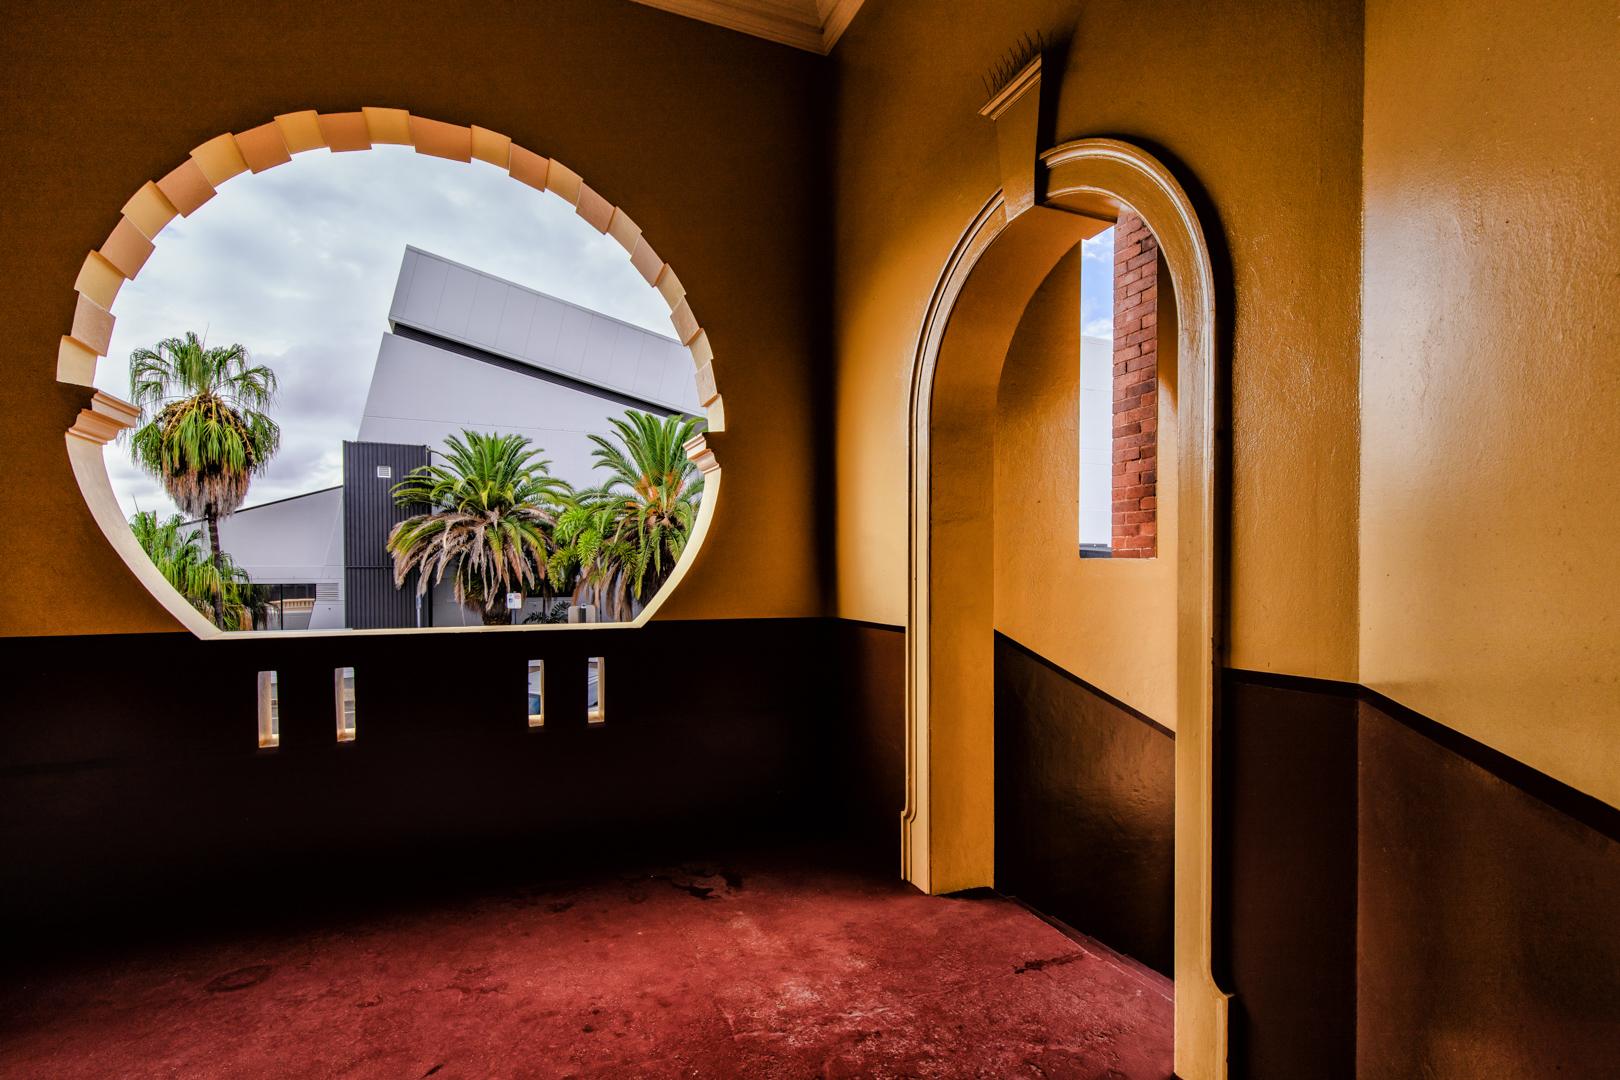 Architecture_Window to the Future_Jane McMenamin_AGr